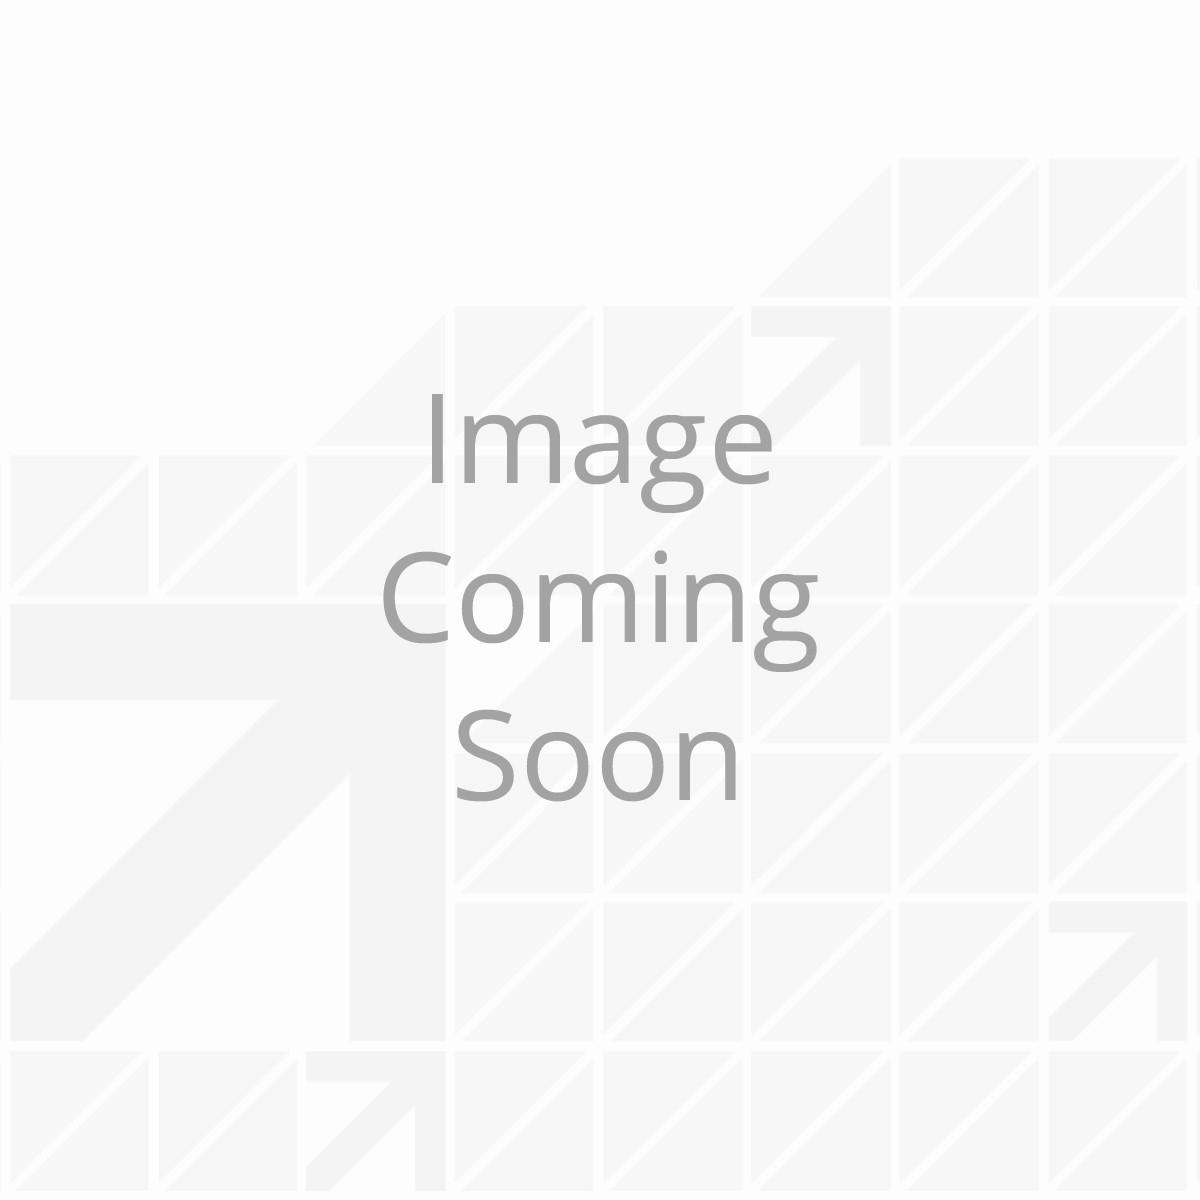 Flex-Air Pinbox W/ Medium Tow; M15, 18K